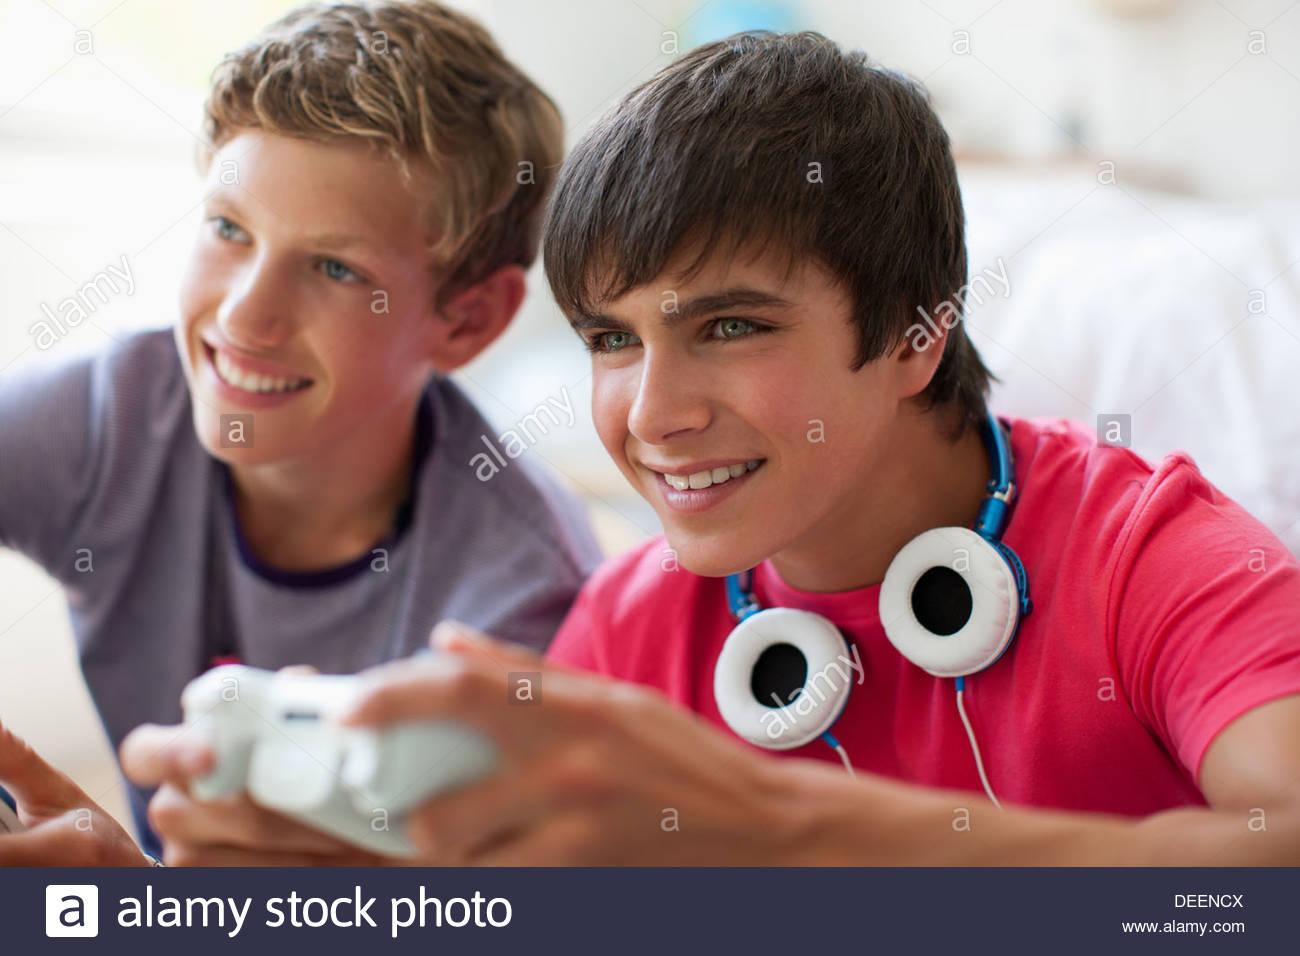 Smiling teenage boys playing video game - Stock Image